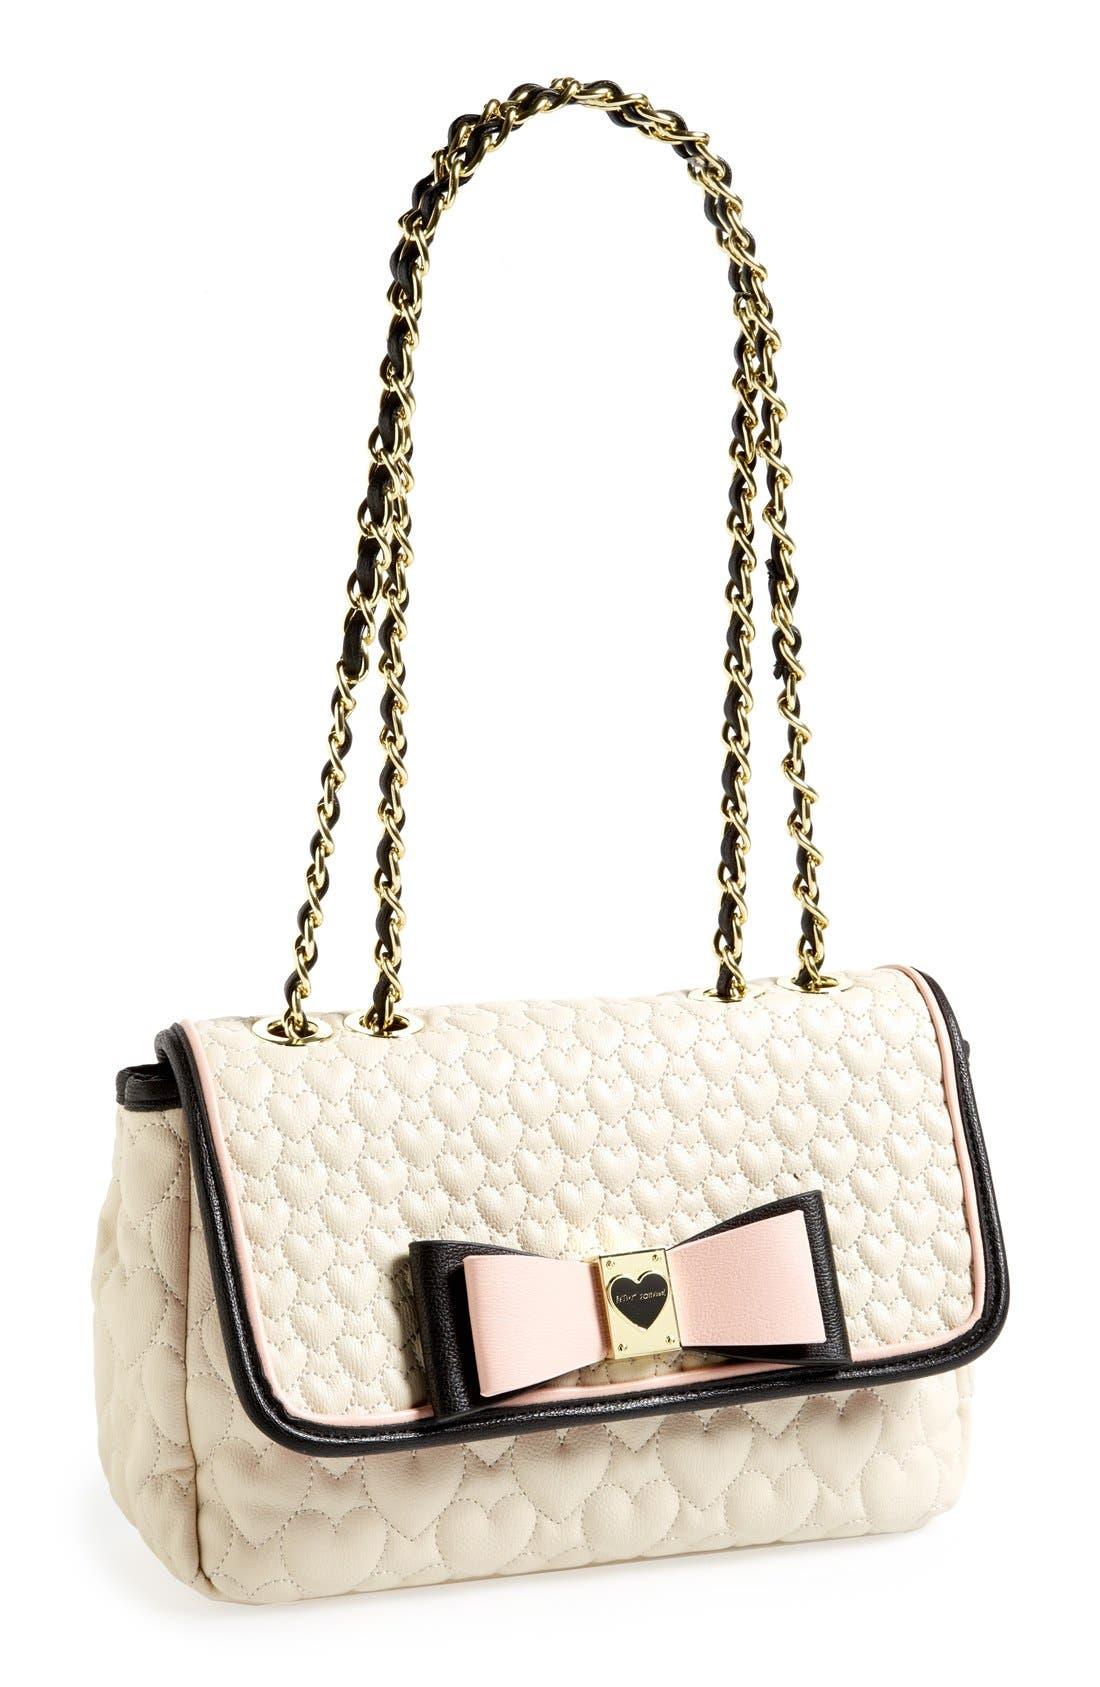 Alternate Image 1 Selected - Betsey Johnson Flapover Shoulder Bag